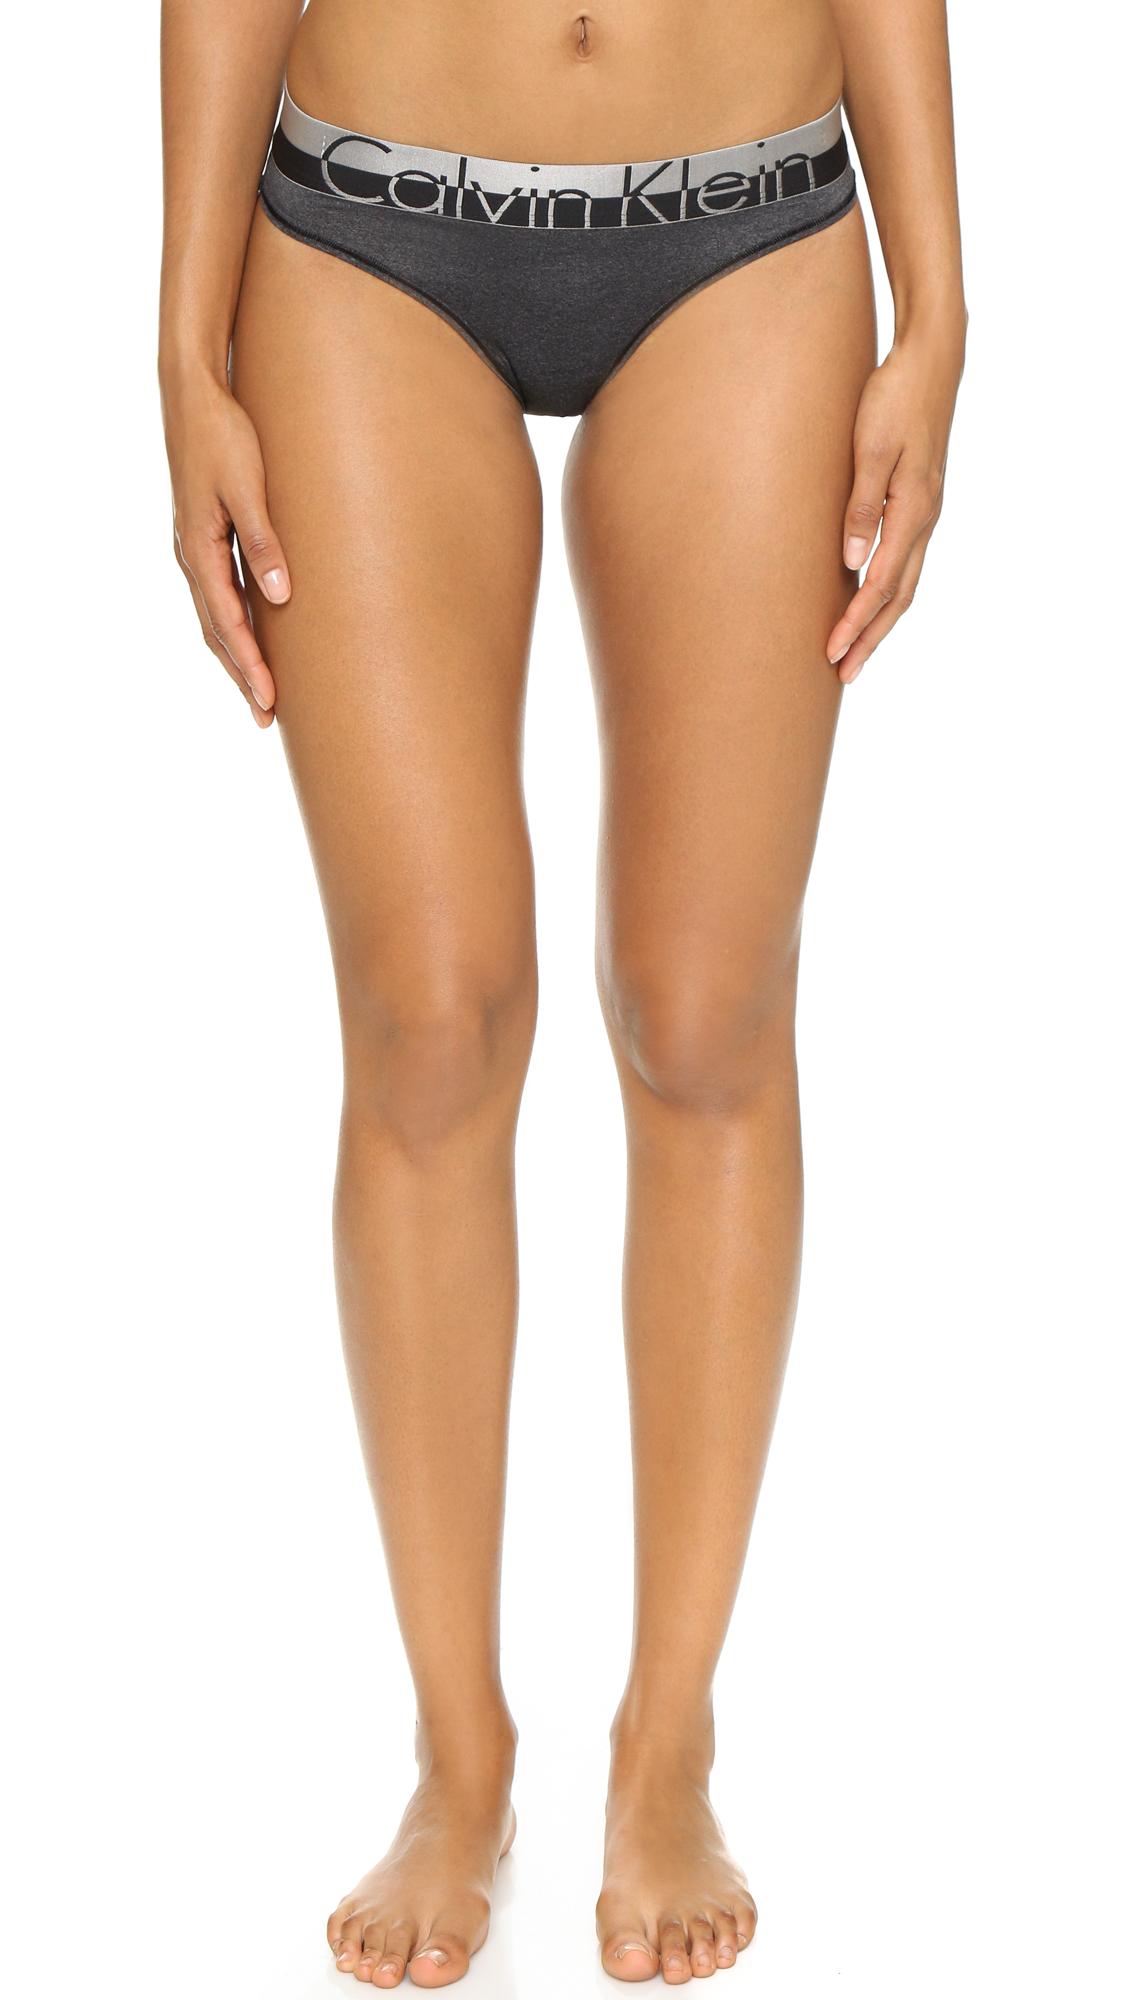 22dc7af96b Calvin Klein Underwear Magnetic Force Bikini Panties on PopScreen